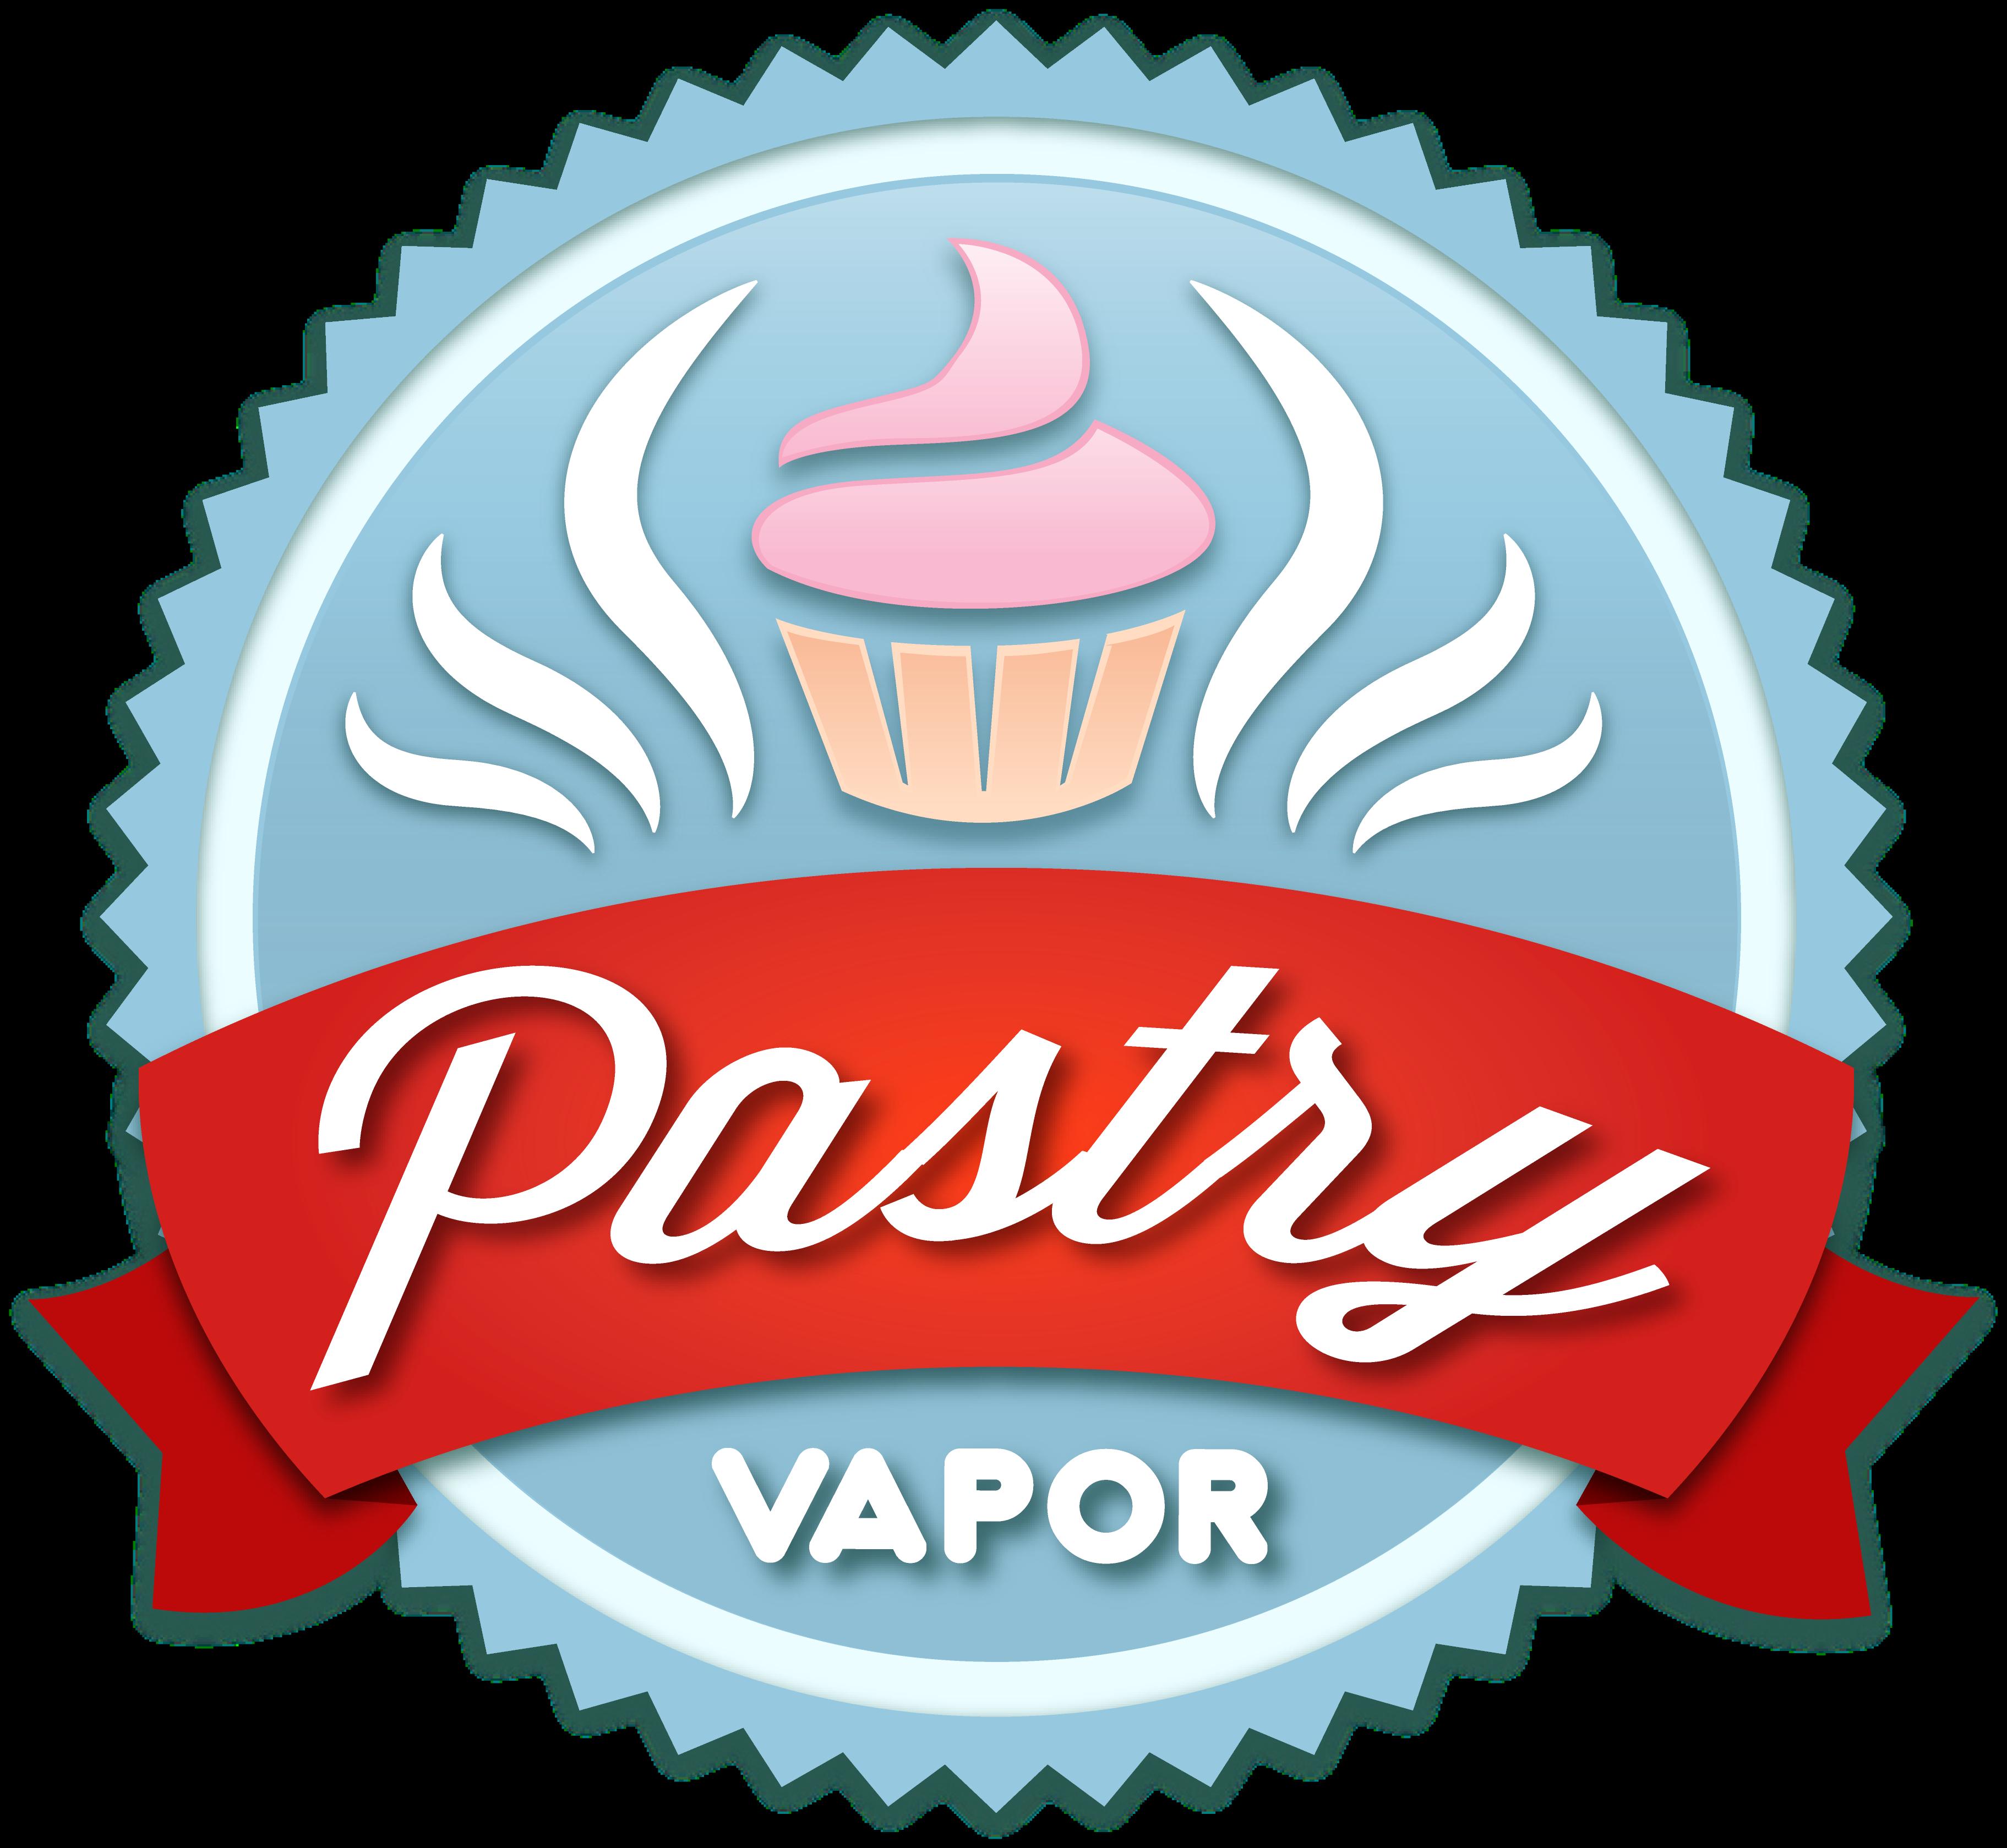 Pastry Vapor